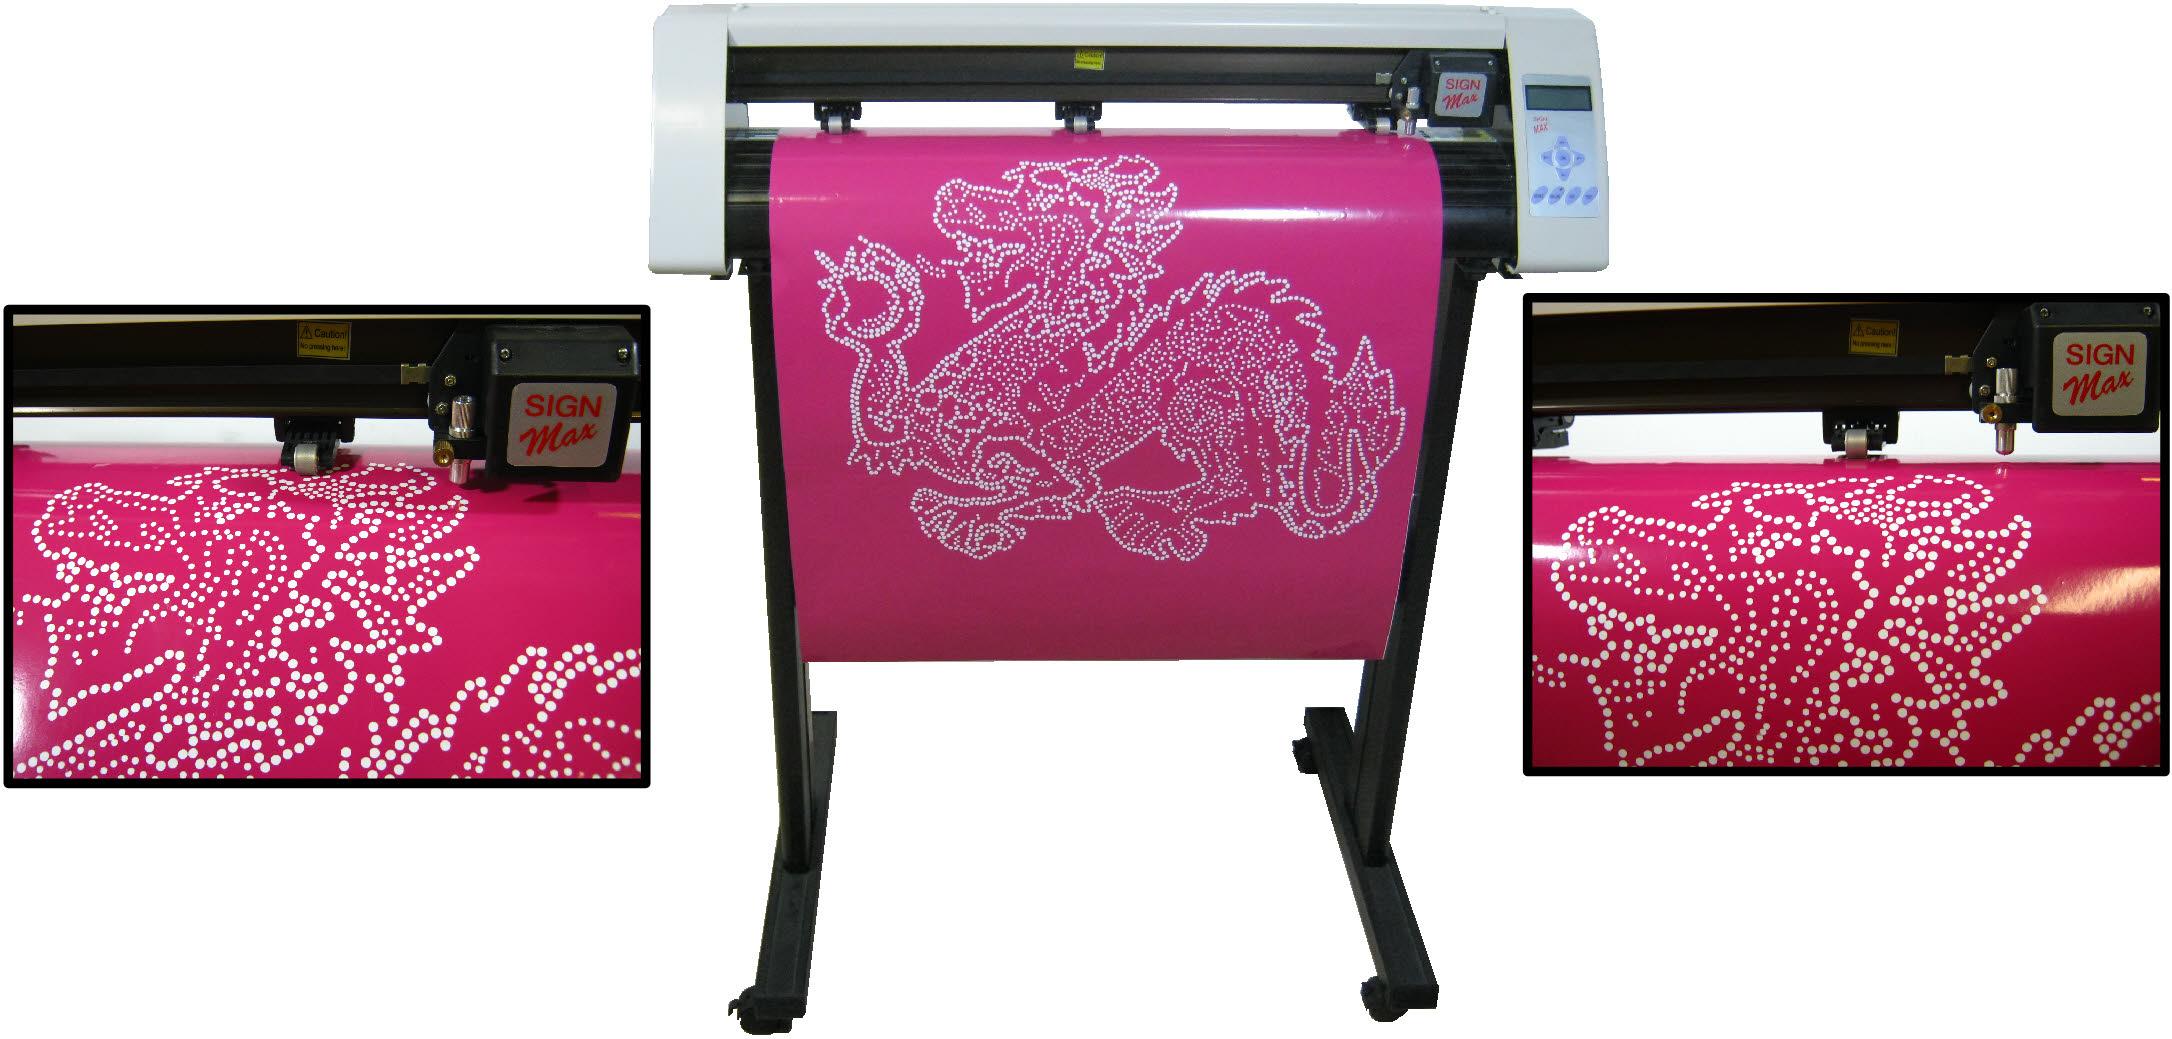 24 Vinyl Cutter For Rhinestone Template Lettering 2014 Pro